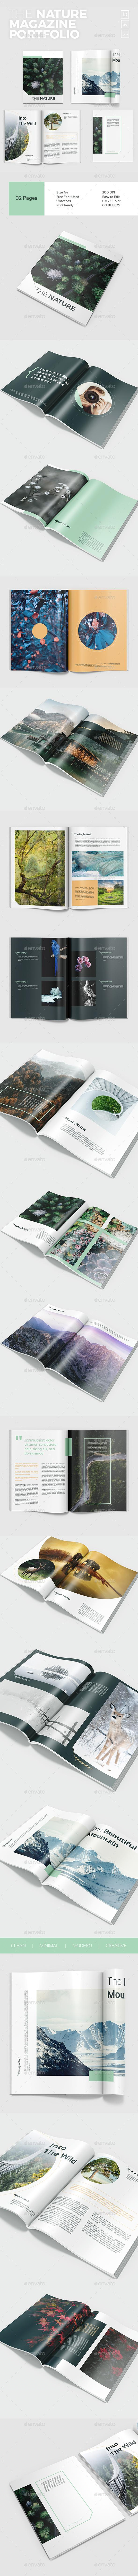 The Nature Magazine Portfolio - Magazines Print Templates